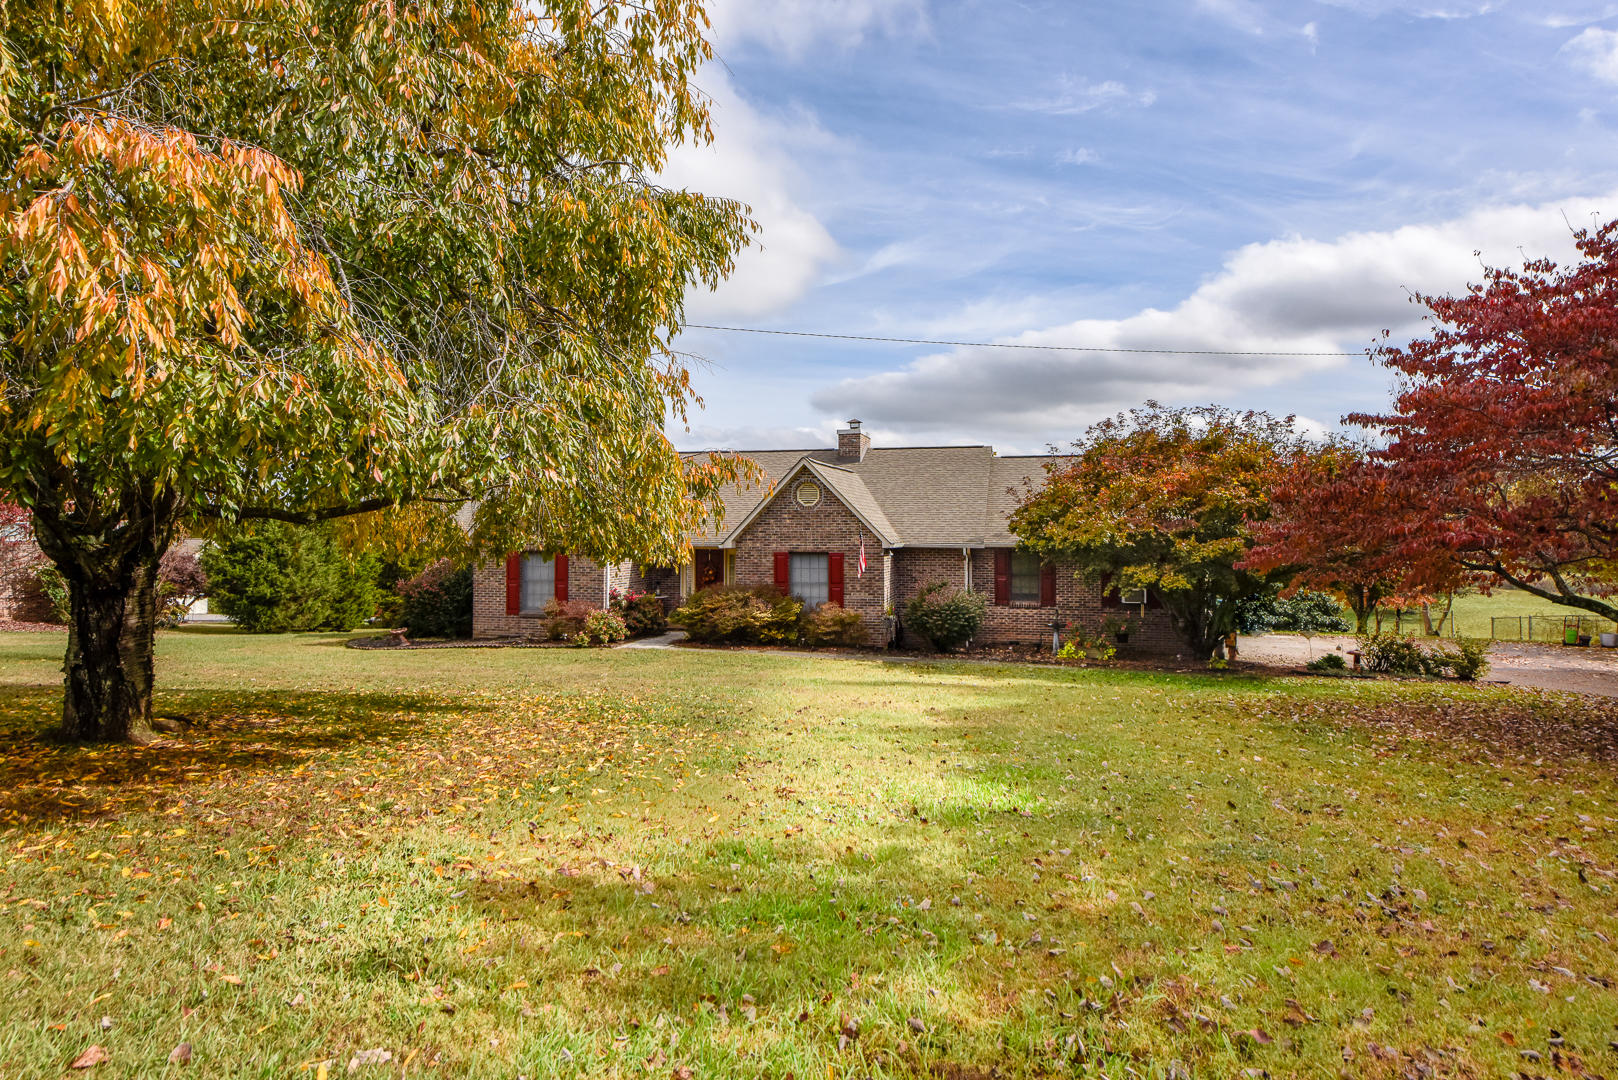 448 Smoky View Estates Drive, Maryville, TN 37801